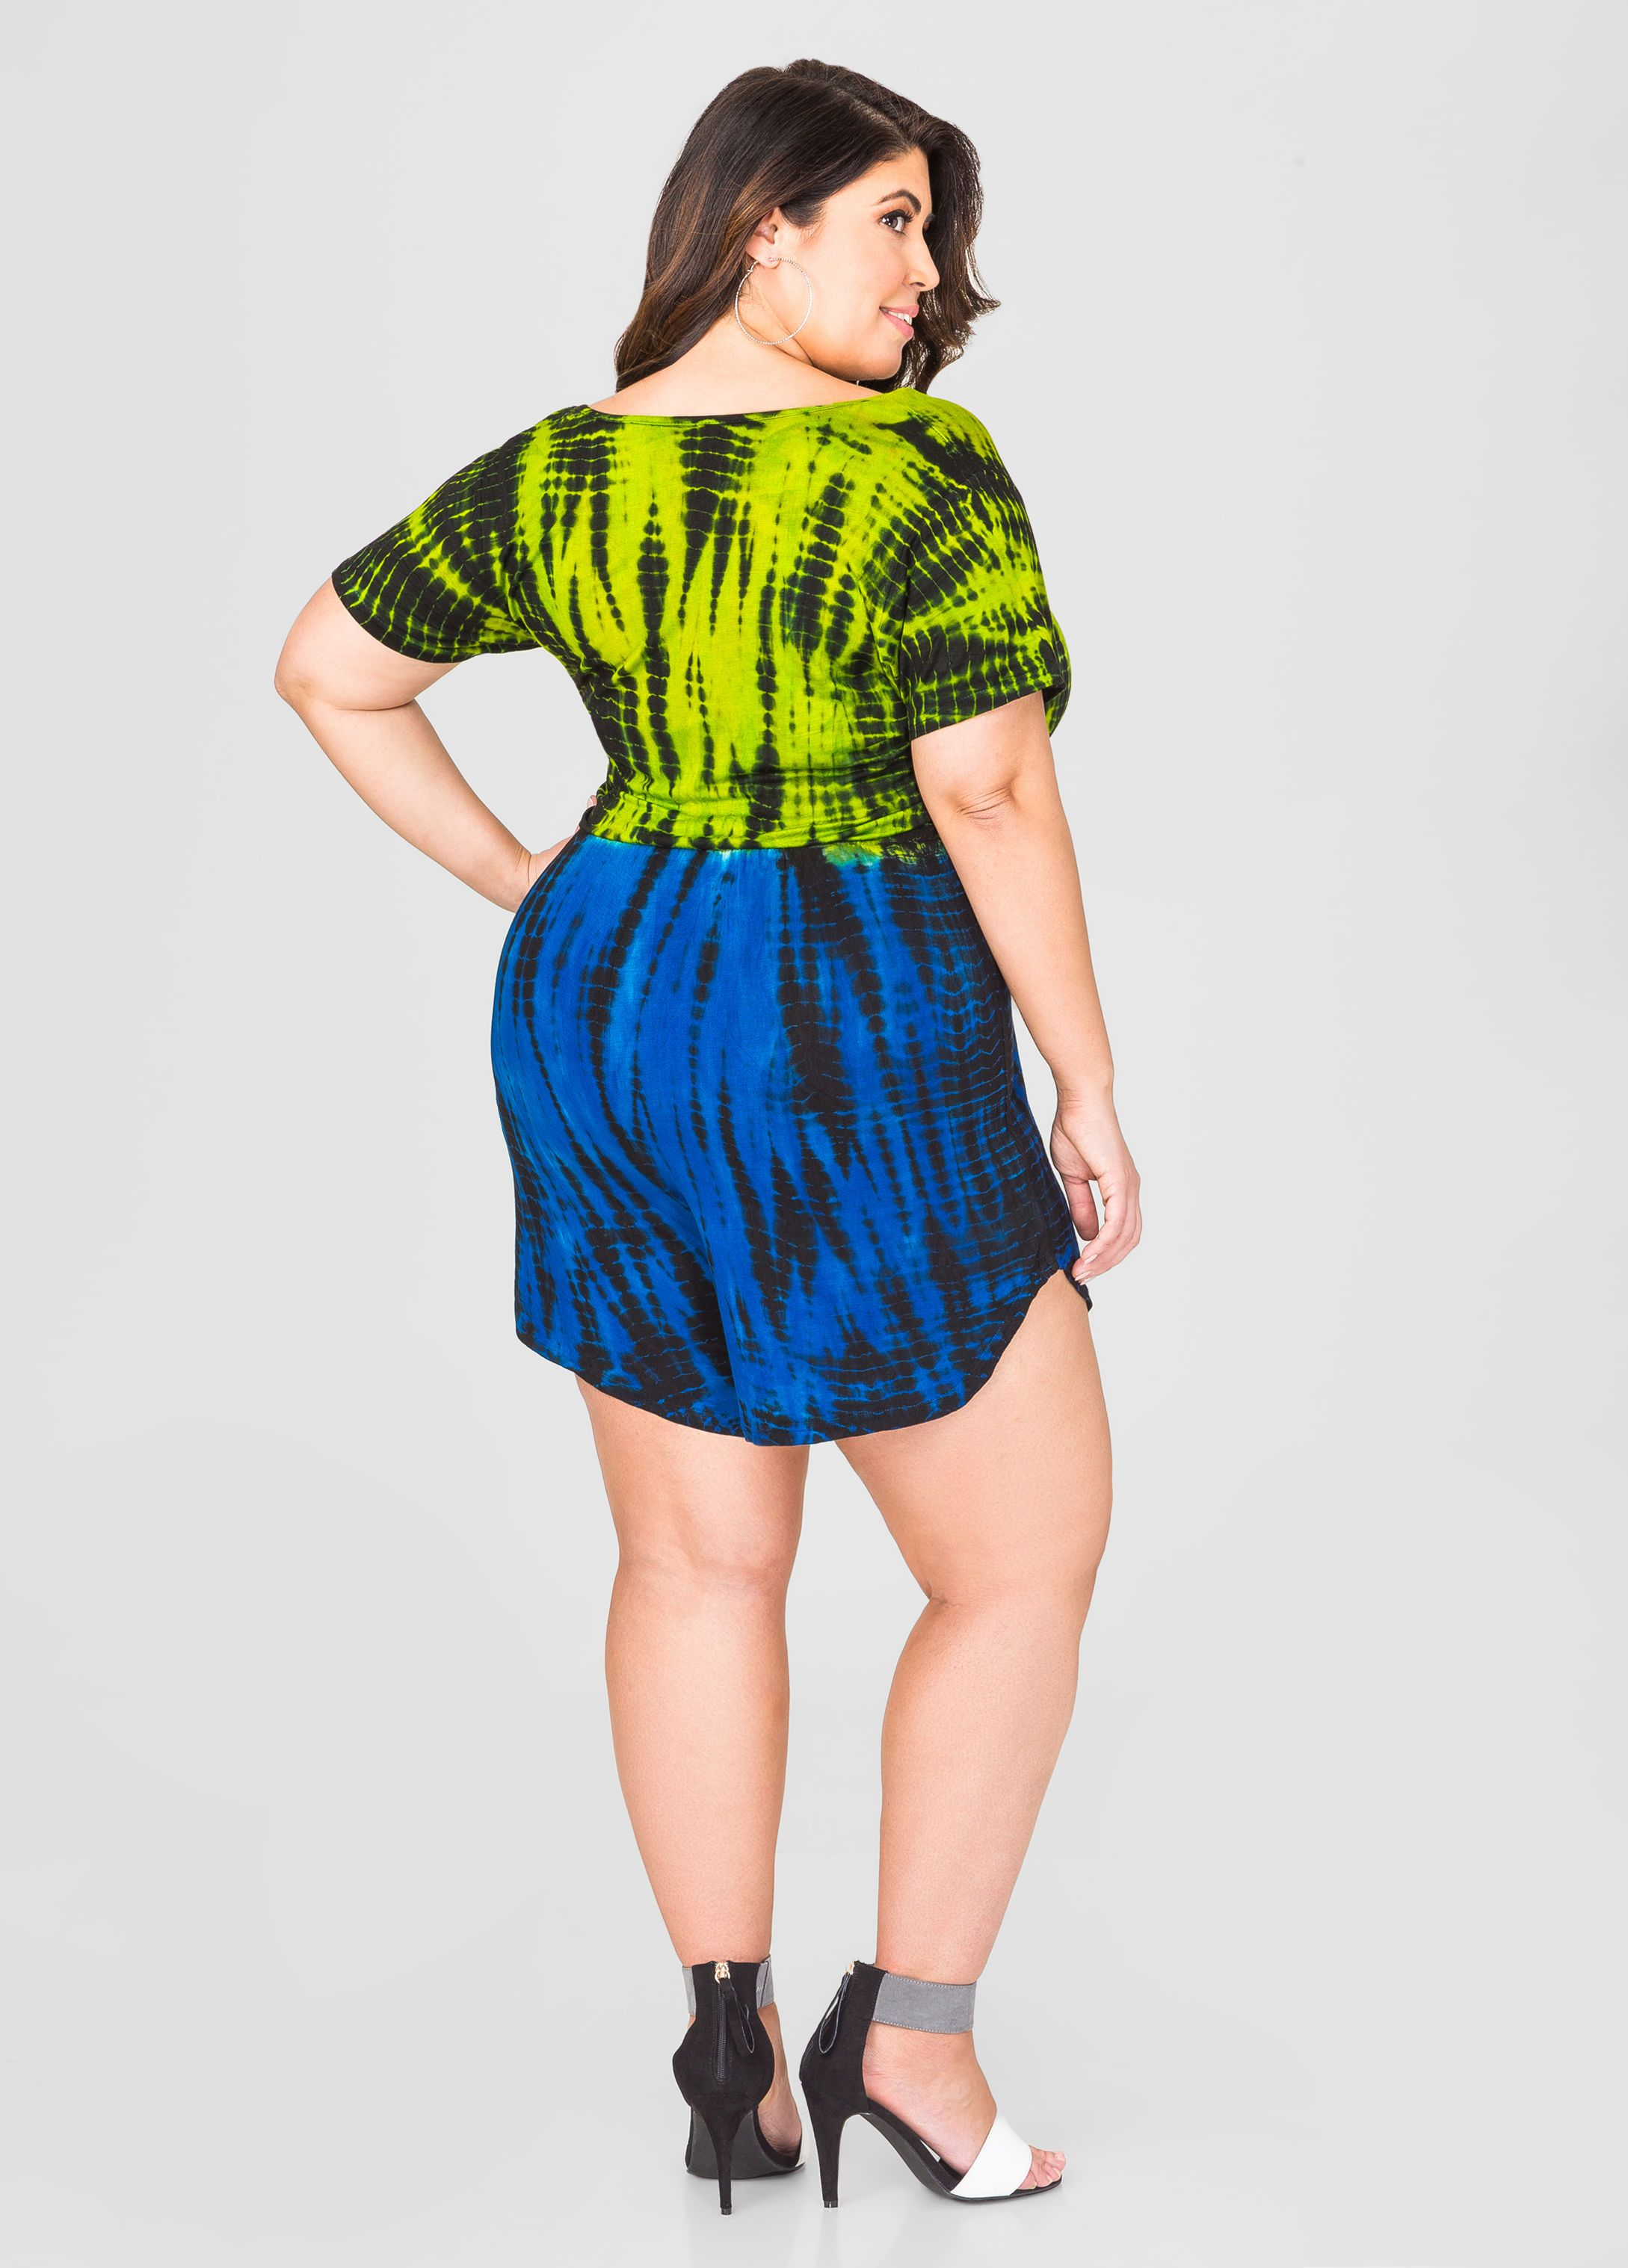 798857bb247 Surplice Tie Dye Romper - Ashley Stewart. Surplice Tie Dye Romper - Ashley  Stewart Best Plus Size Clothing ...